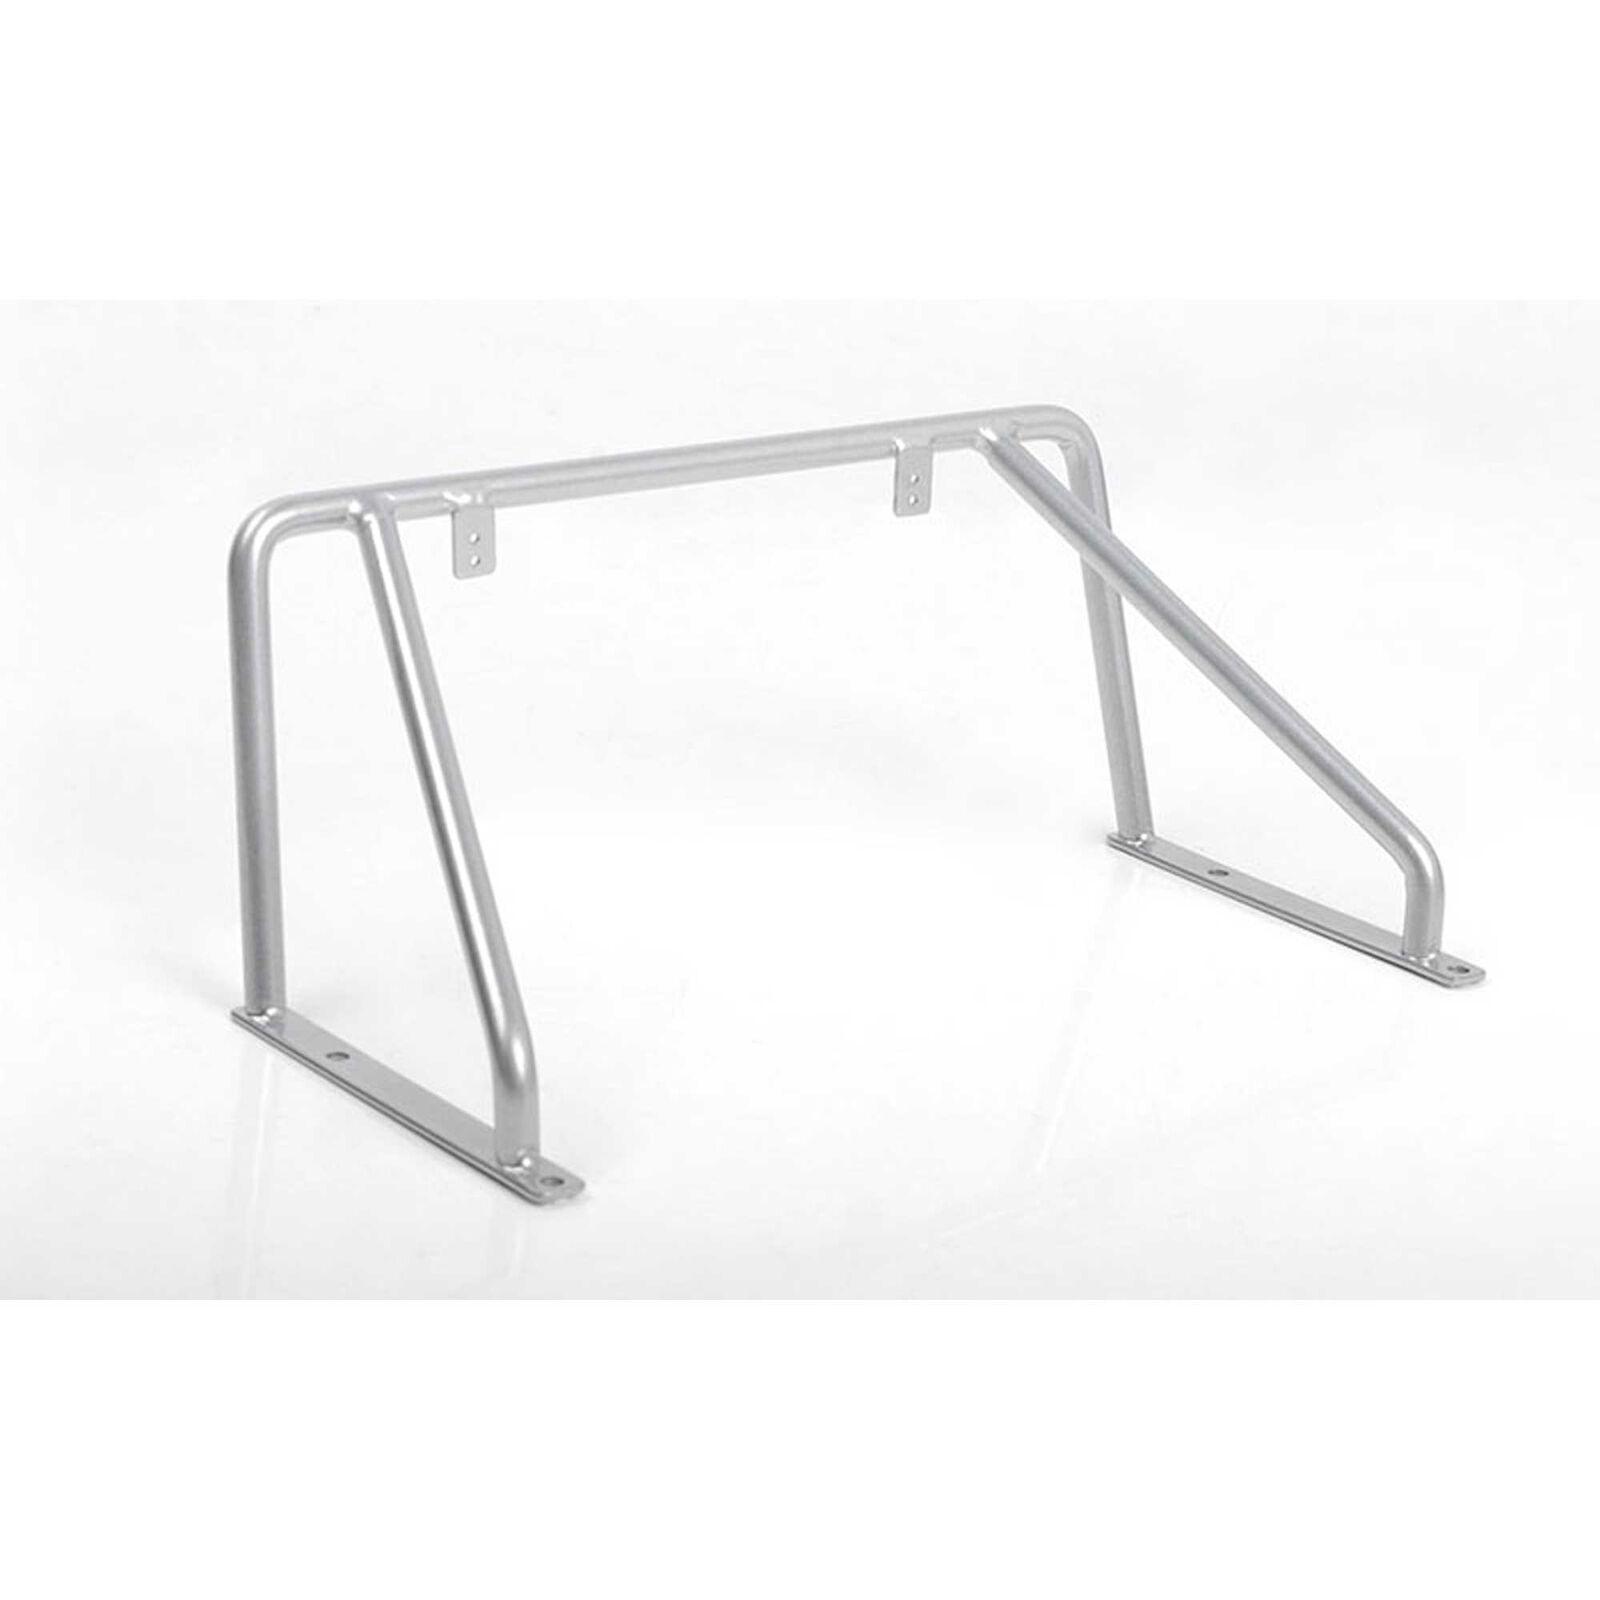 Steel Tube Roll Bar-VS4-10 Origin Halfcab Silver